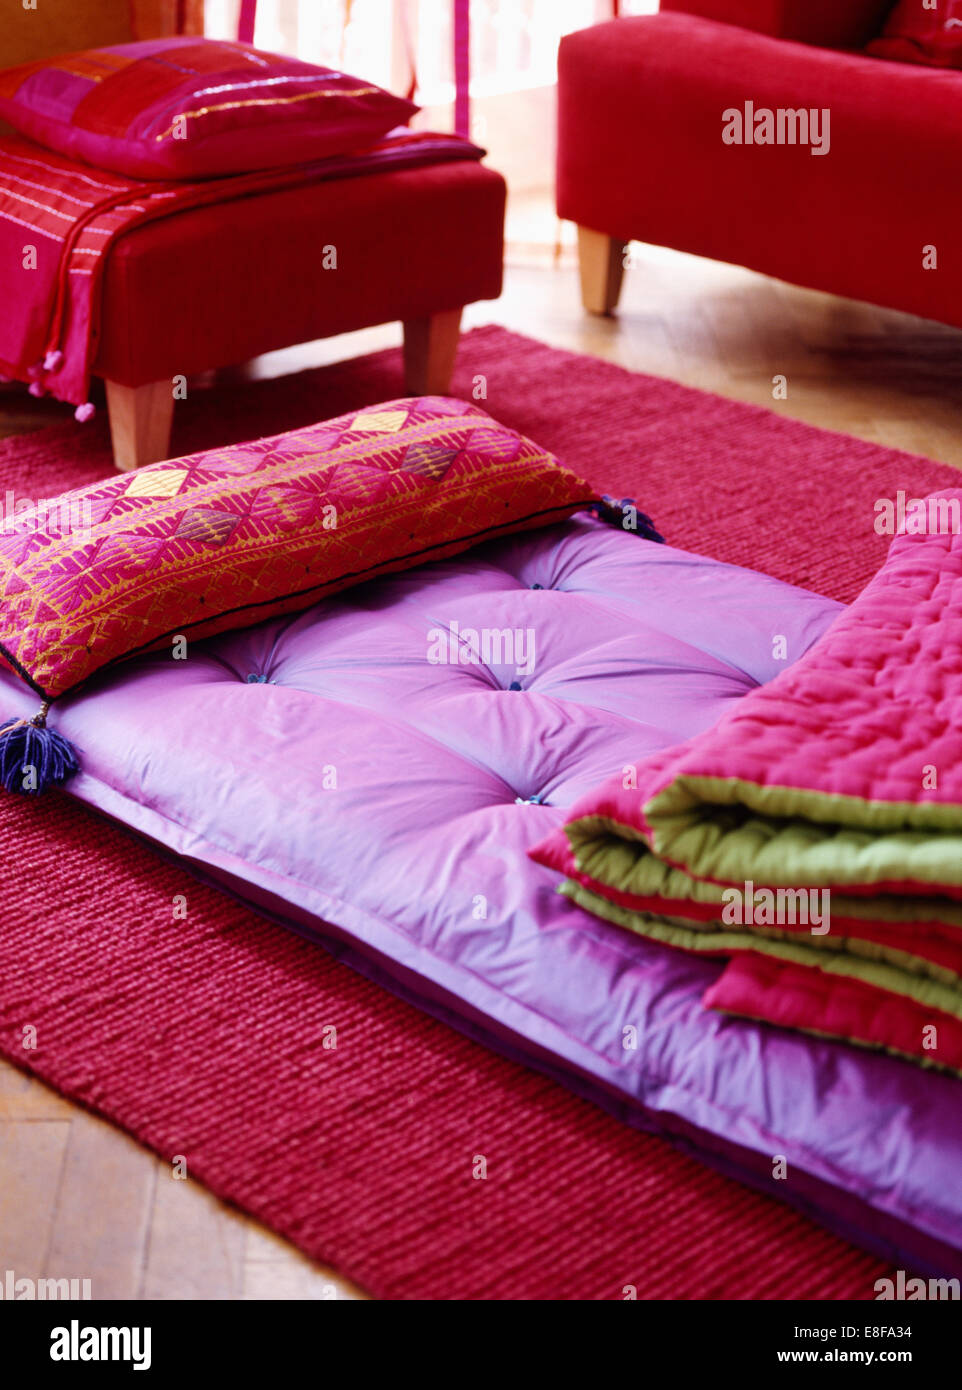 close up of folded pink green quilt on purple silk futon mattress with pink patterned cushion close up of folded pink green quilt on purple silk futon mattress      rh   alamy